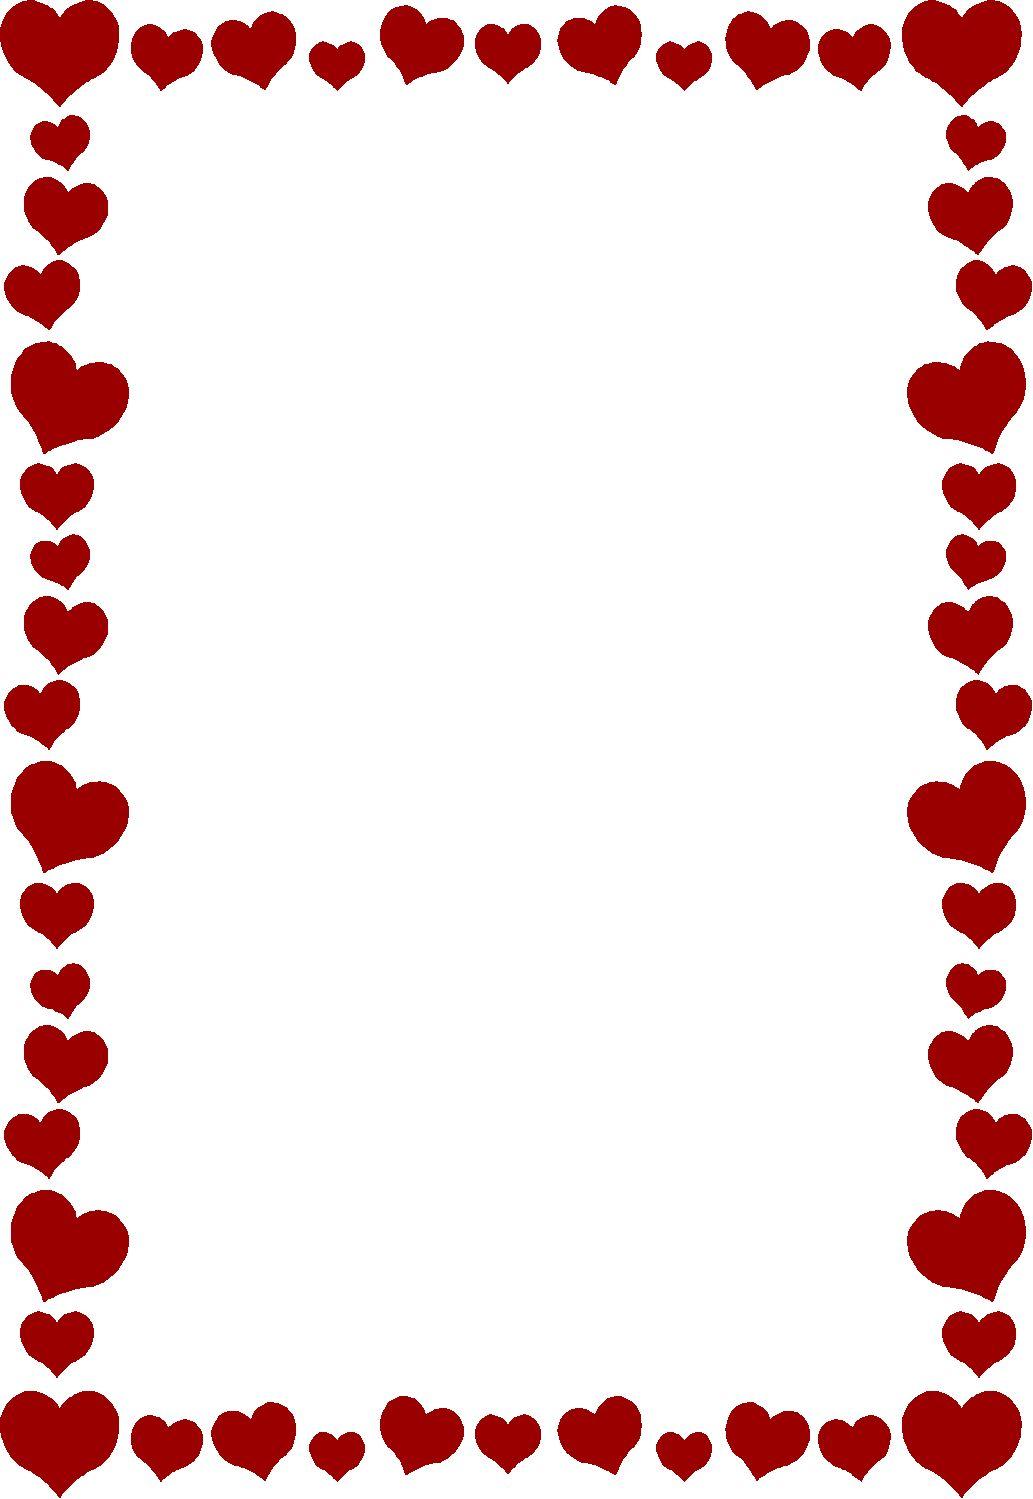 Heart Frame | Hearts N Doves | Heart clip art, Heart ...